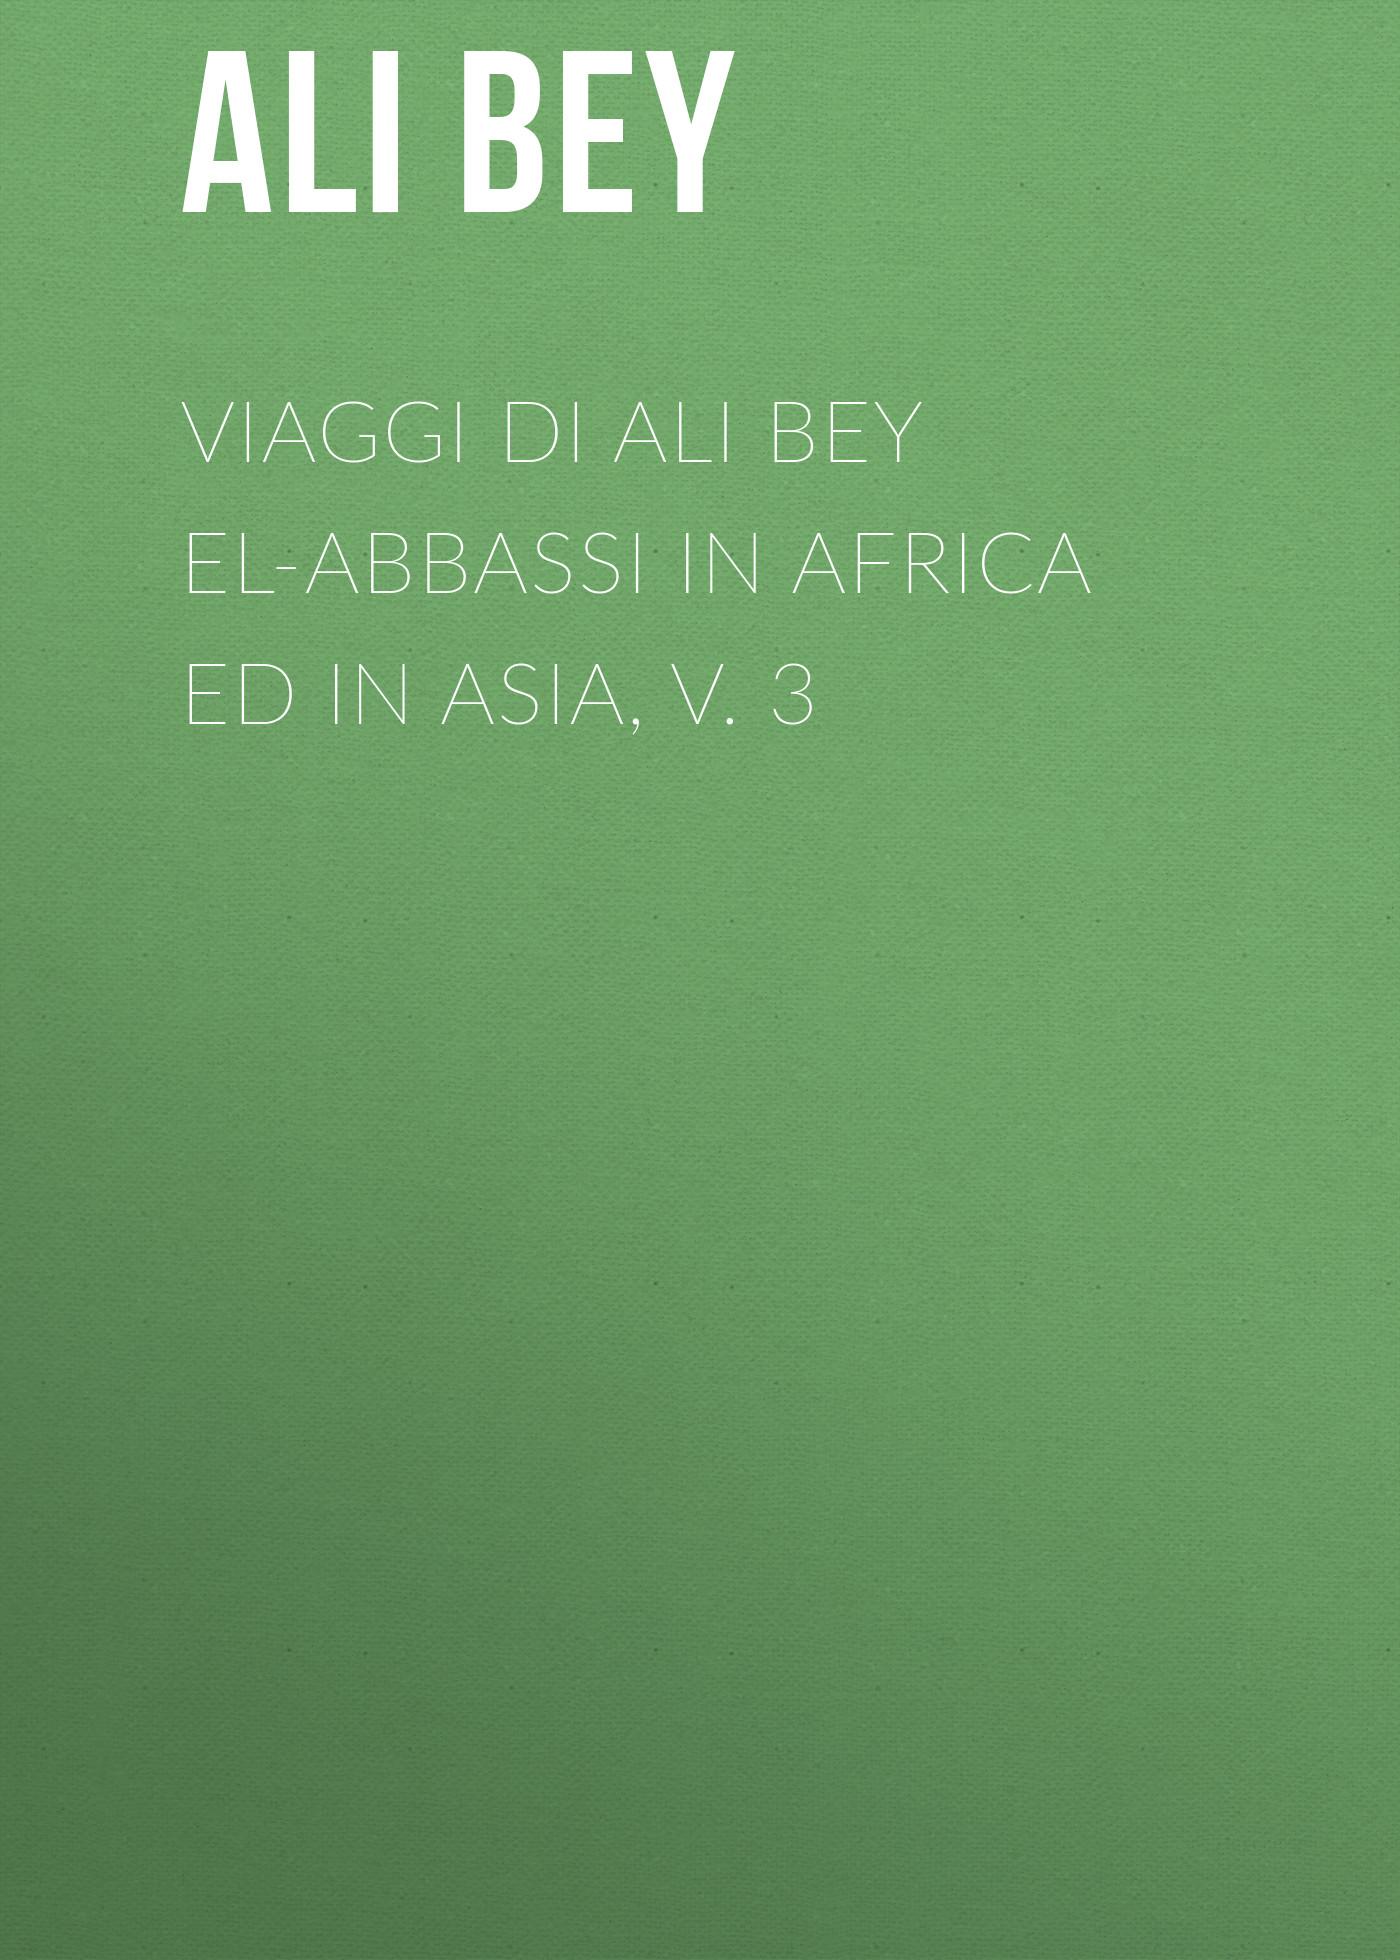 Ali Bey Viaggi di Ali Bey el-Abbassi in Africa ed in Asia, v. 3 dawoud bey